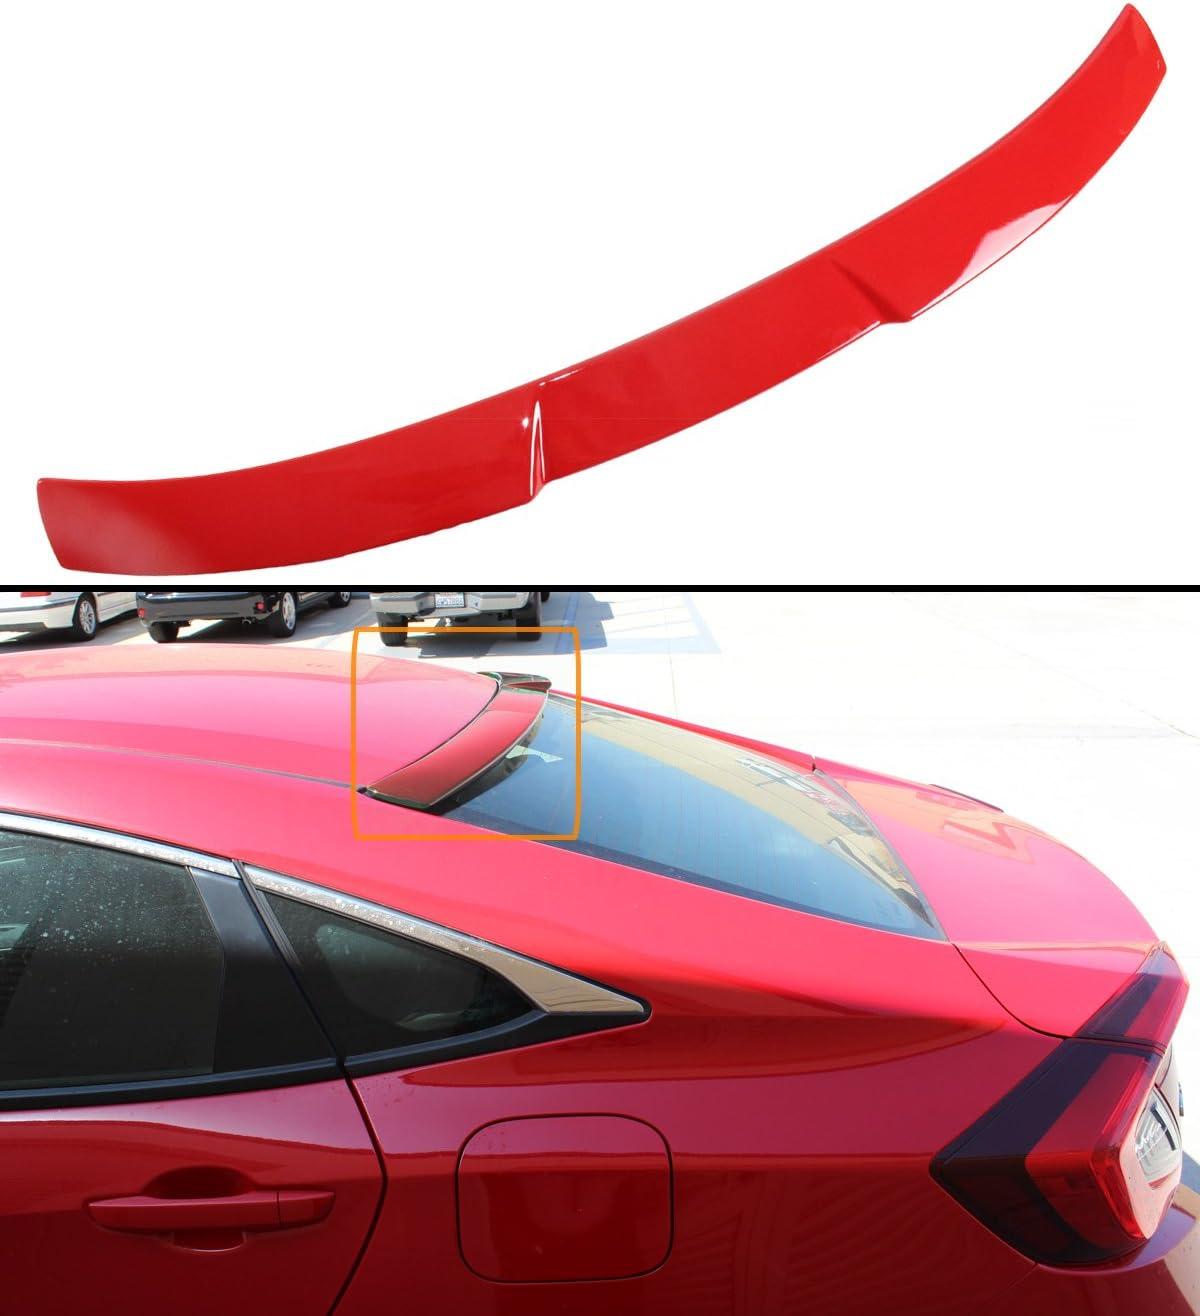 Cuztom Tuning Fits for 2016-2018 10TH Gen Honda Civic X 4 Door Sedan Glossy White Rear Window Roof Spoiler